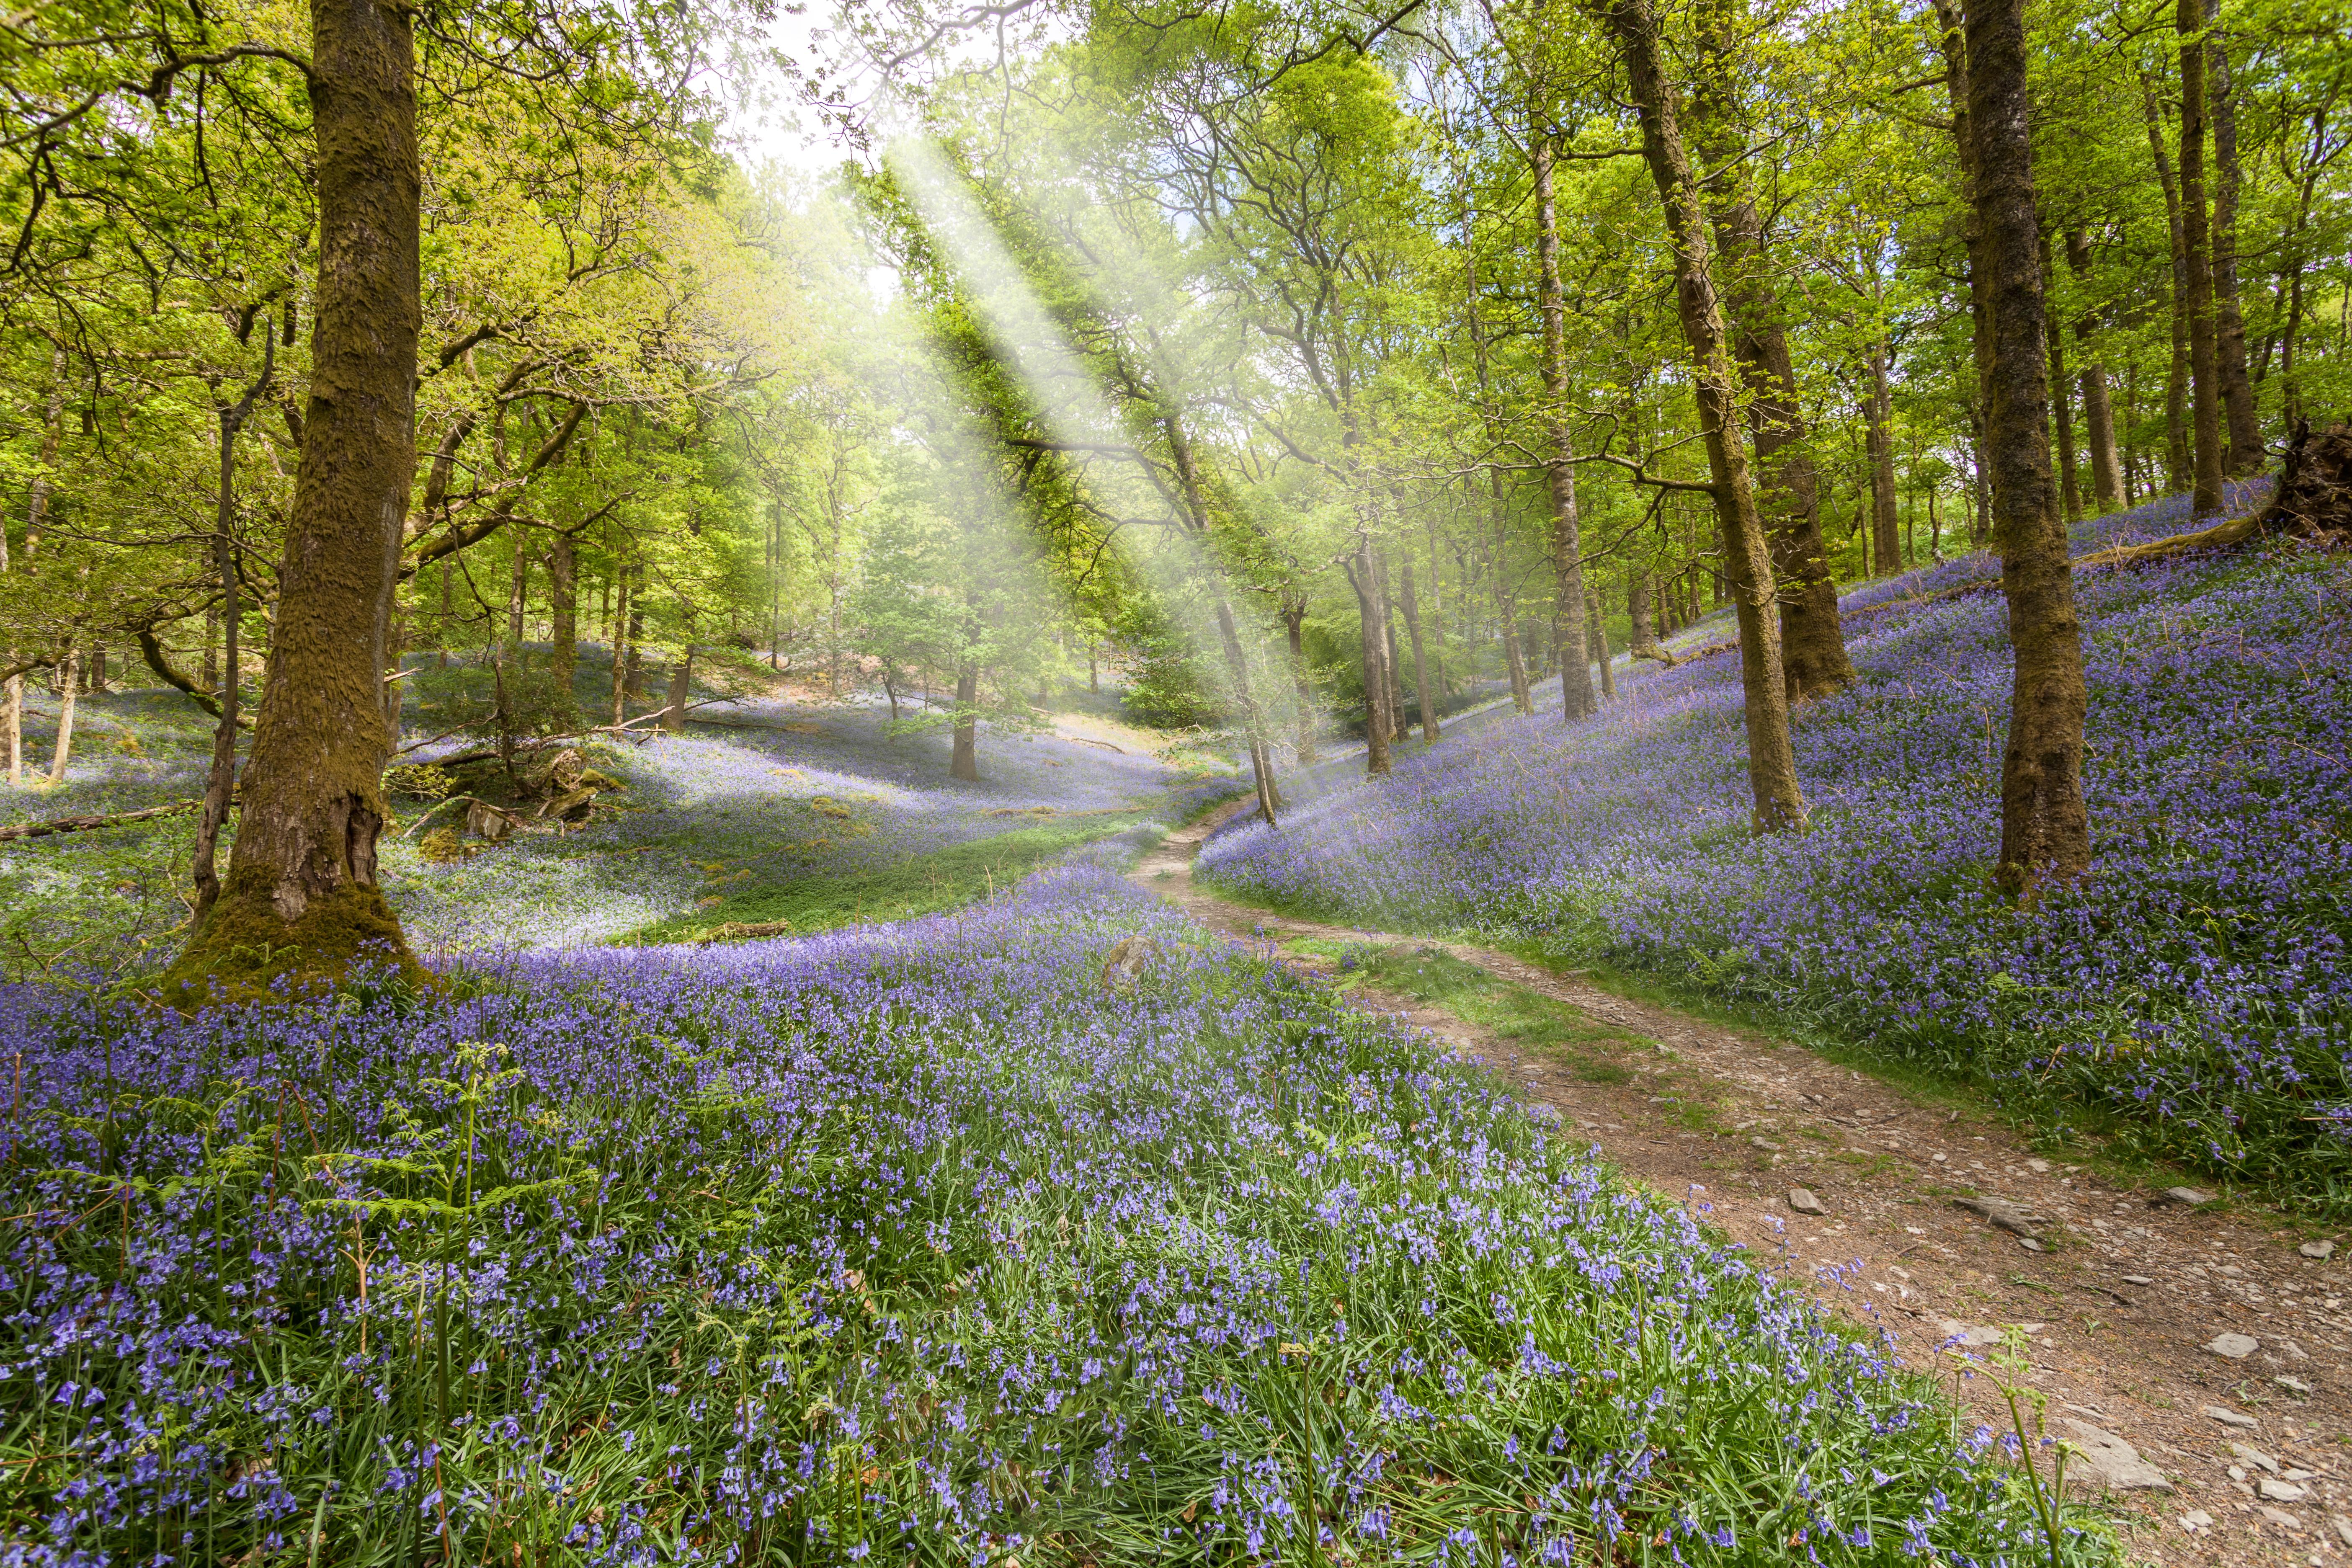 обои лес, деревья, дорога, цветы картинки фото